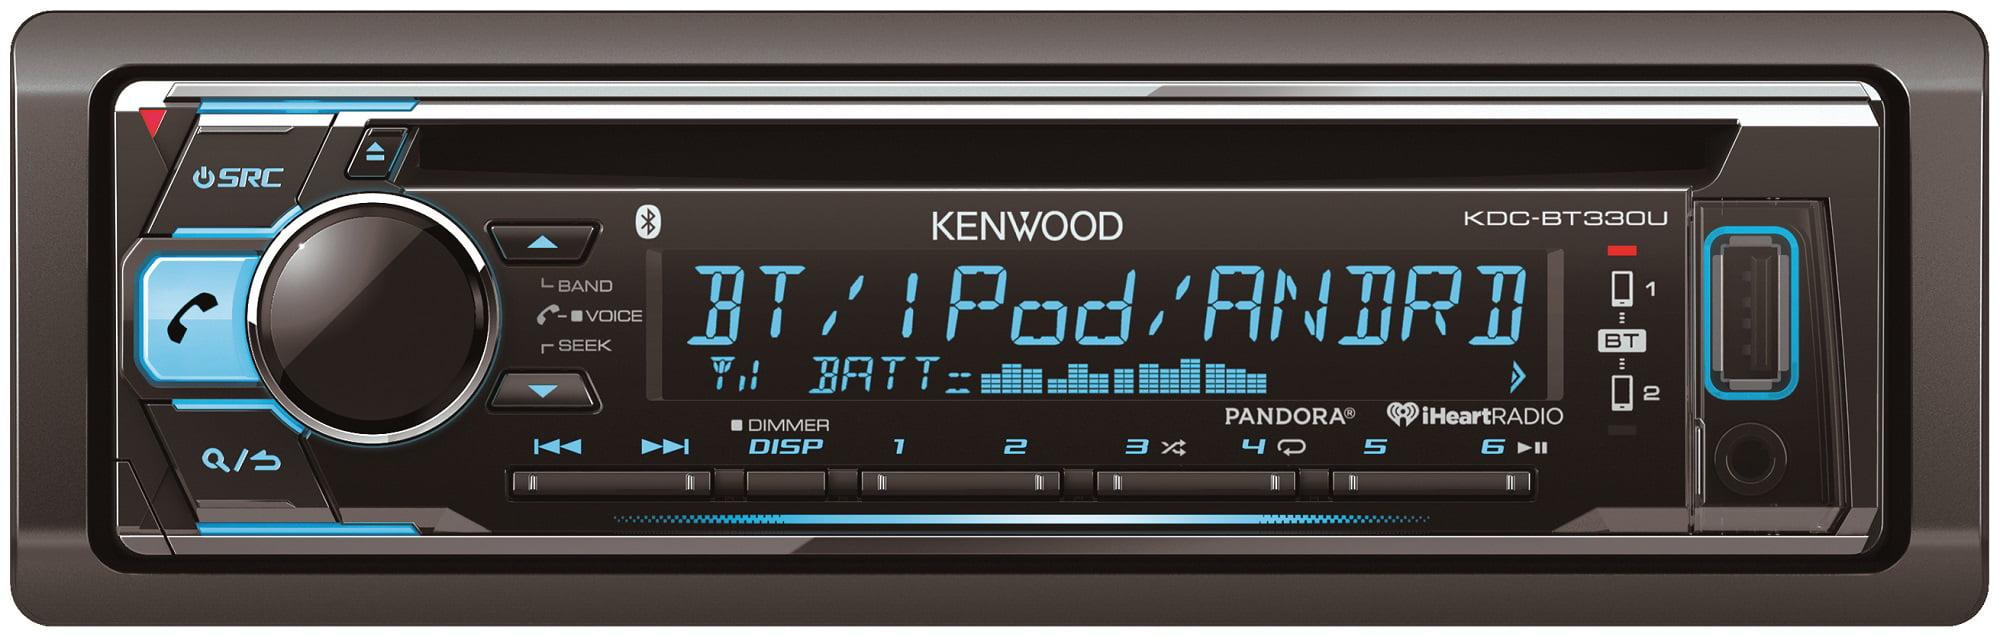 3bb97768 214a 4963 84c1 6f943f47def7_1.b97547793559aeb4b74eb7493d456aaa kenwood am fm cd in dash kdc bt330u receiver with built in kenwood kdc 210u wiring diagram at gsmx.co